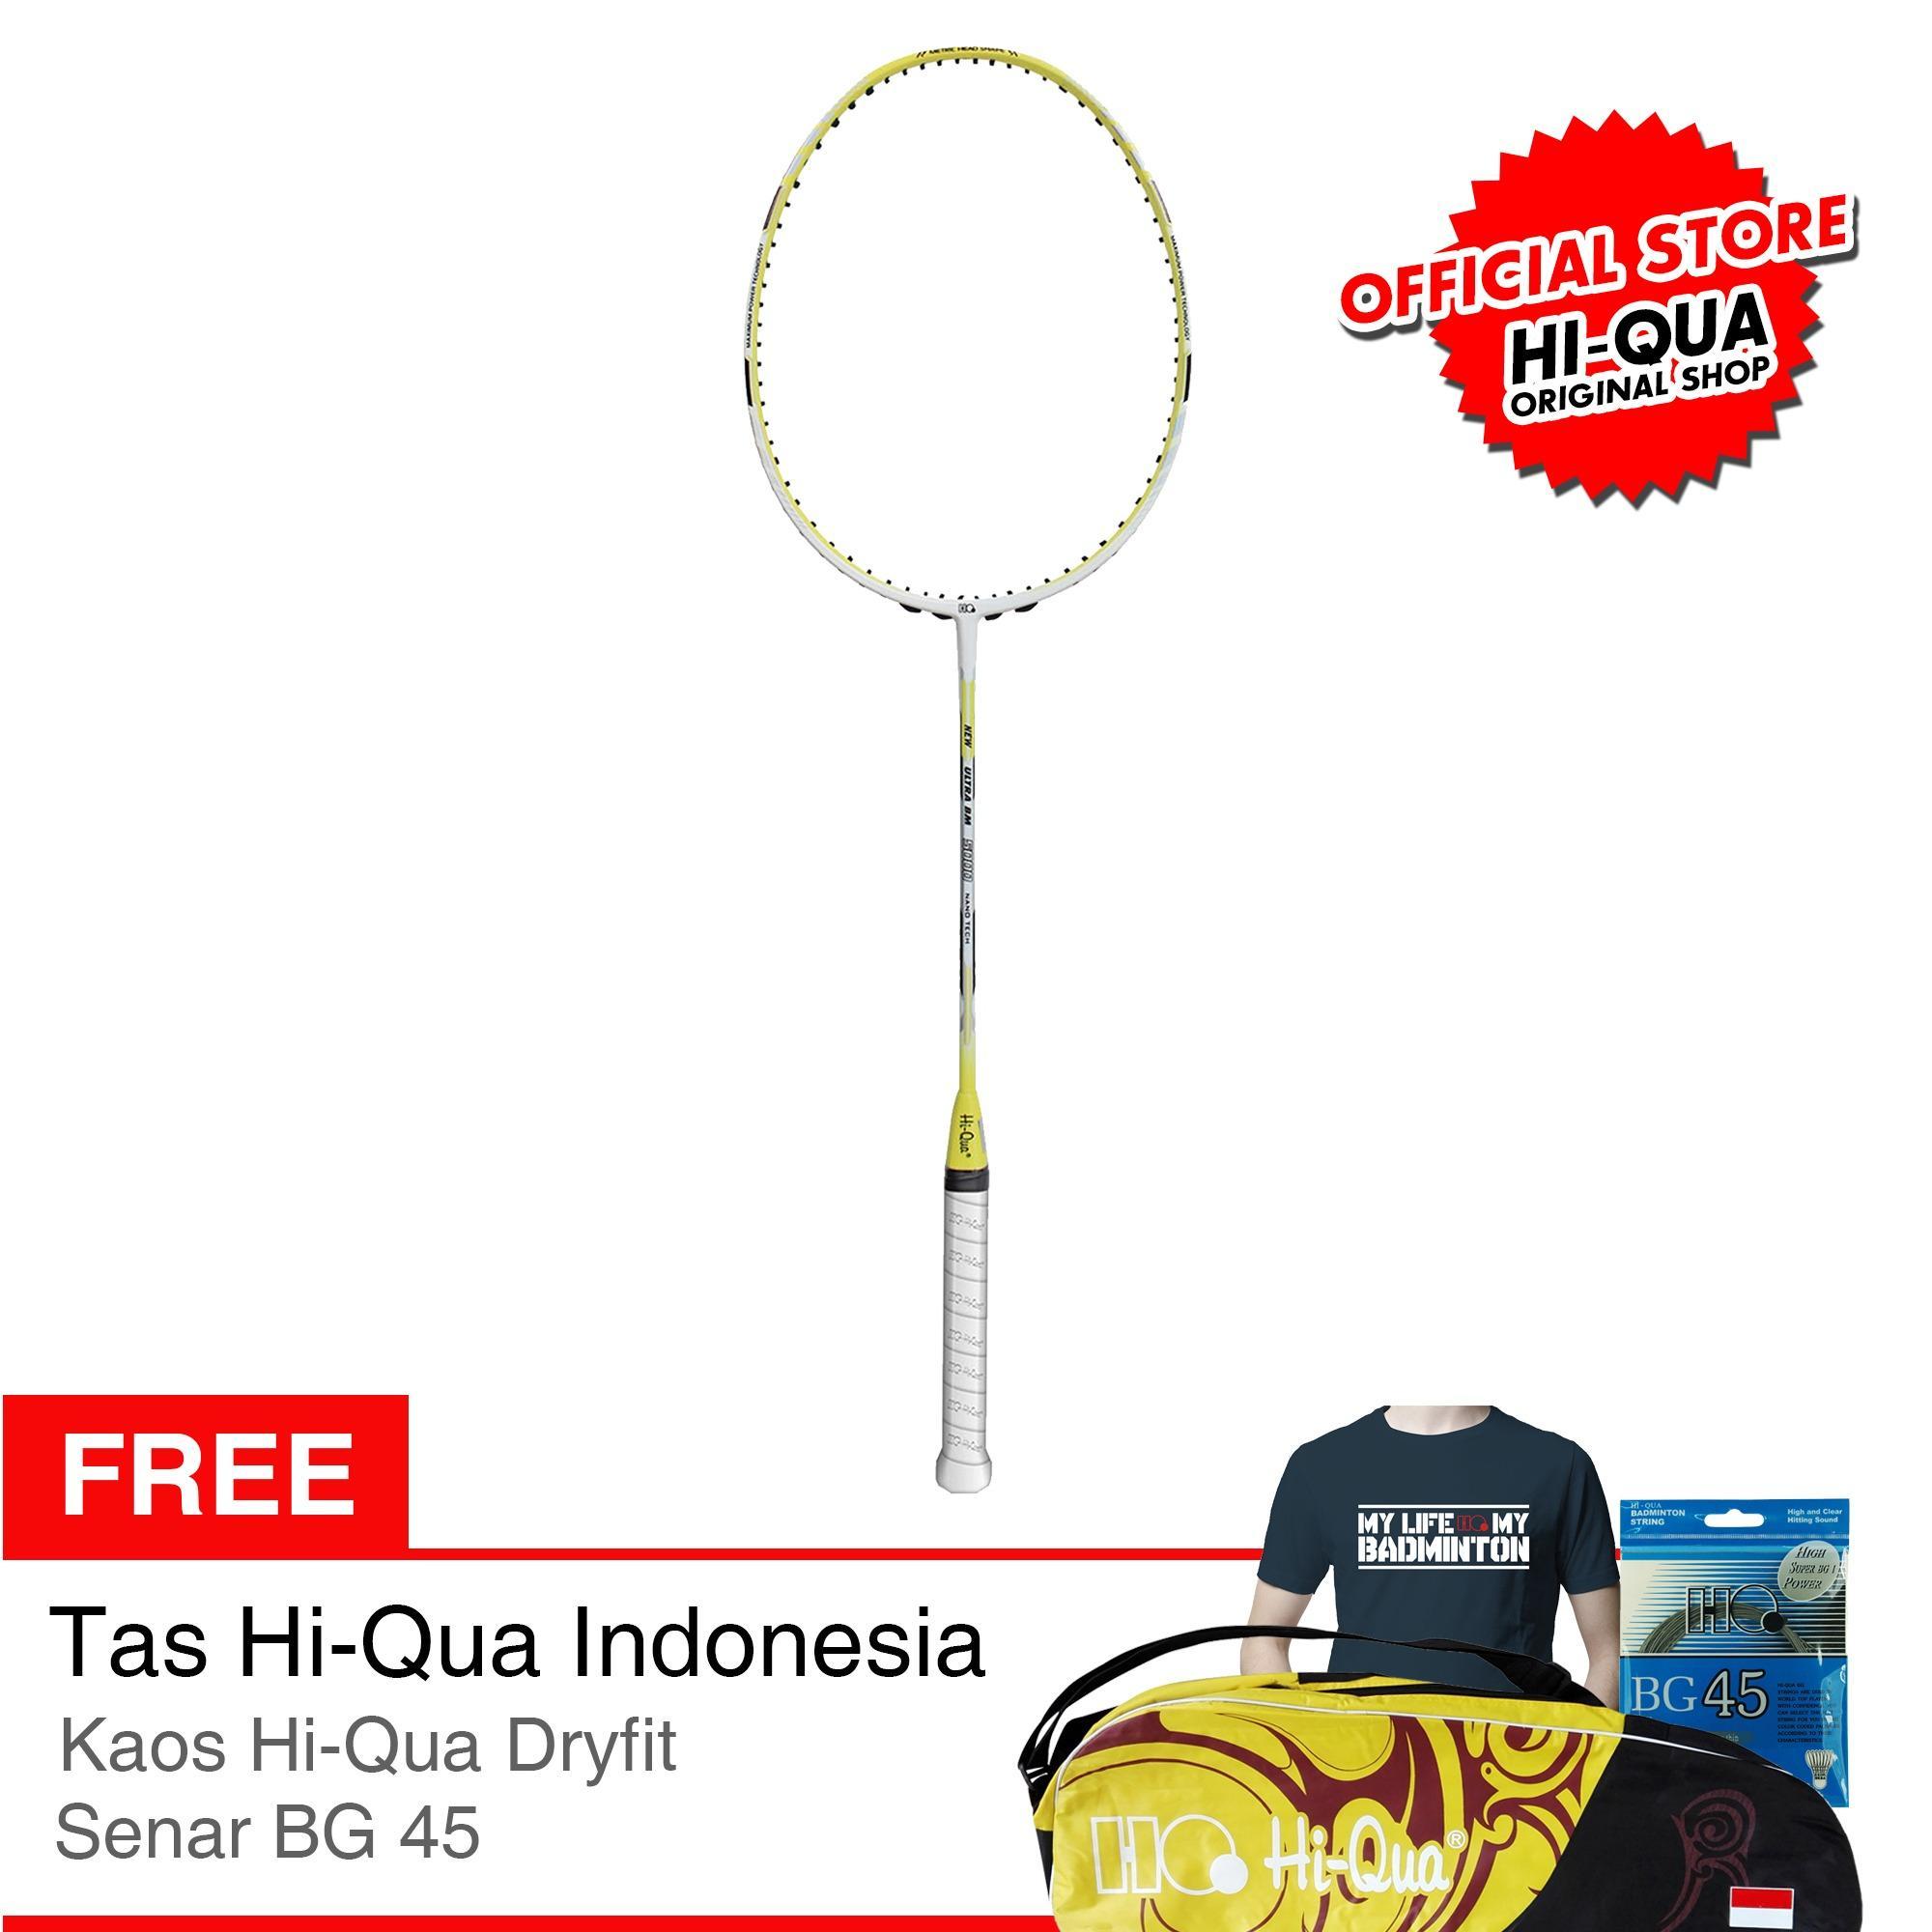 Ongkos Kirim Hi Qua Raket Bulutangkis Badminton New Ultra Bm 5000 Bumblebee Free Senar Bg45 Tas Kaos Di Jawa Timur